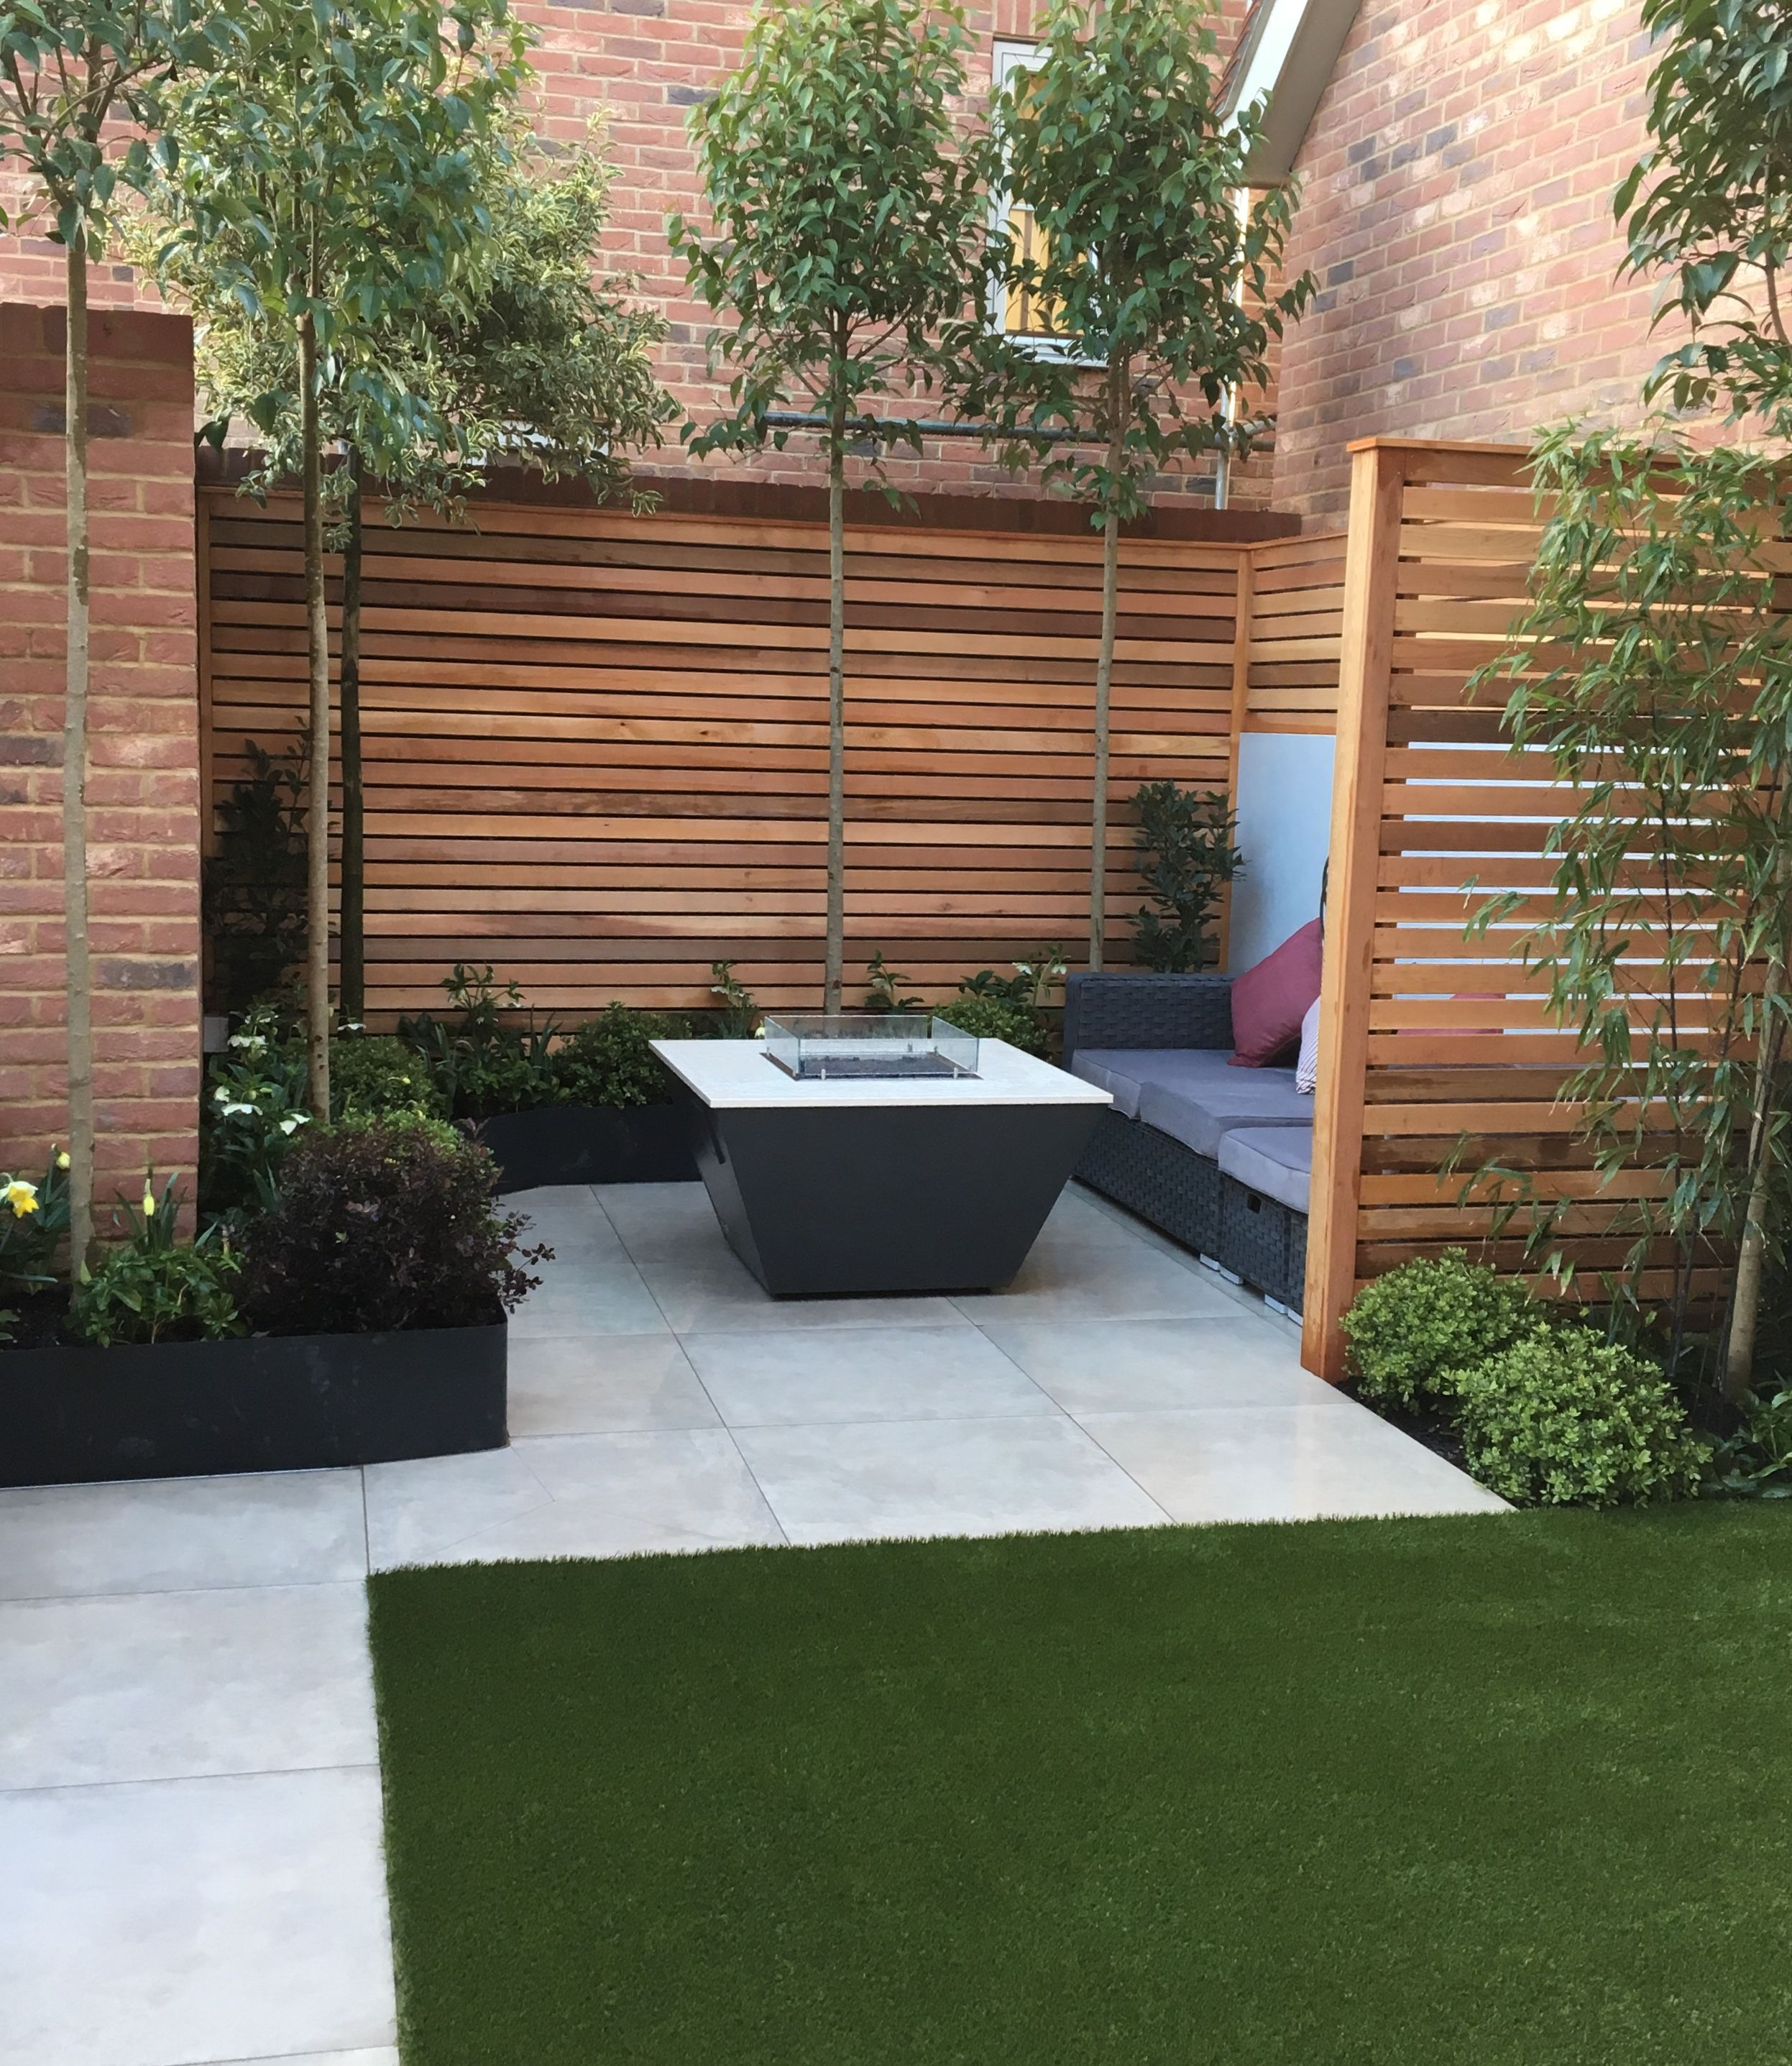 Contemporary Town Garden With Gas Fire Pit And Cedar Battens Outdoor Patio Designs Outdoor Landscape Design Patio Garden Design